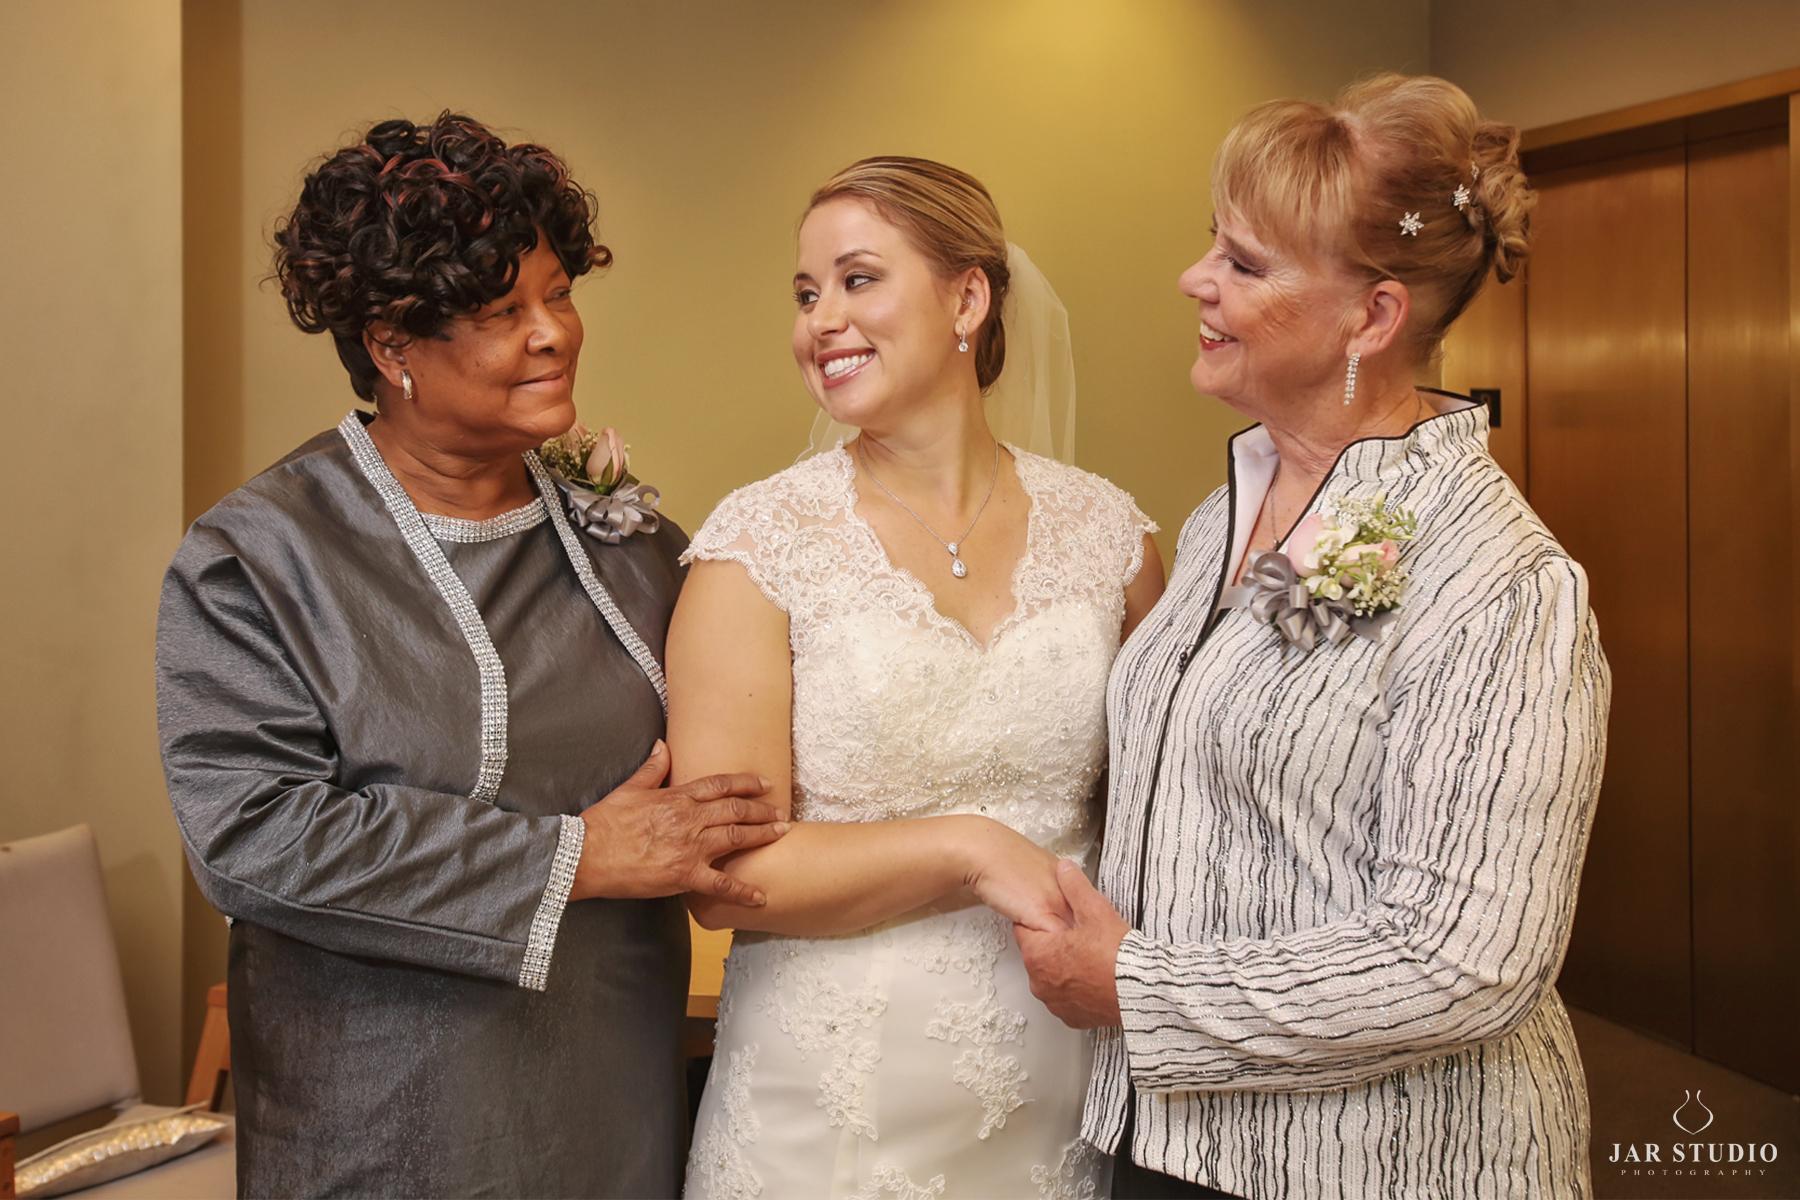 08-mothers-wedding-day-moment-jarstudio.jpg